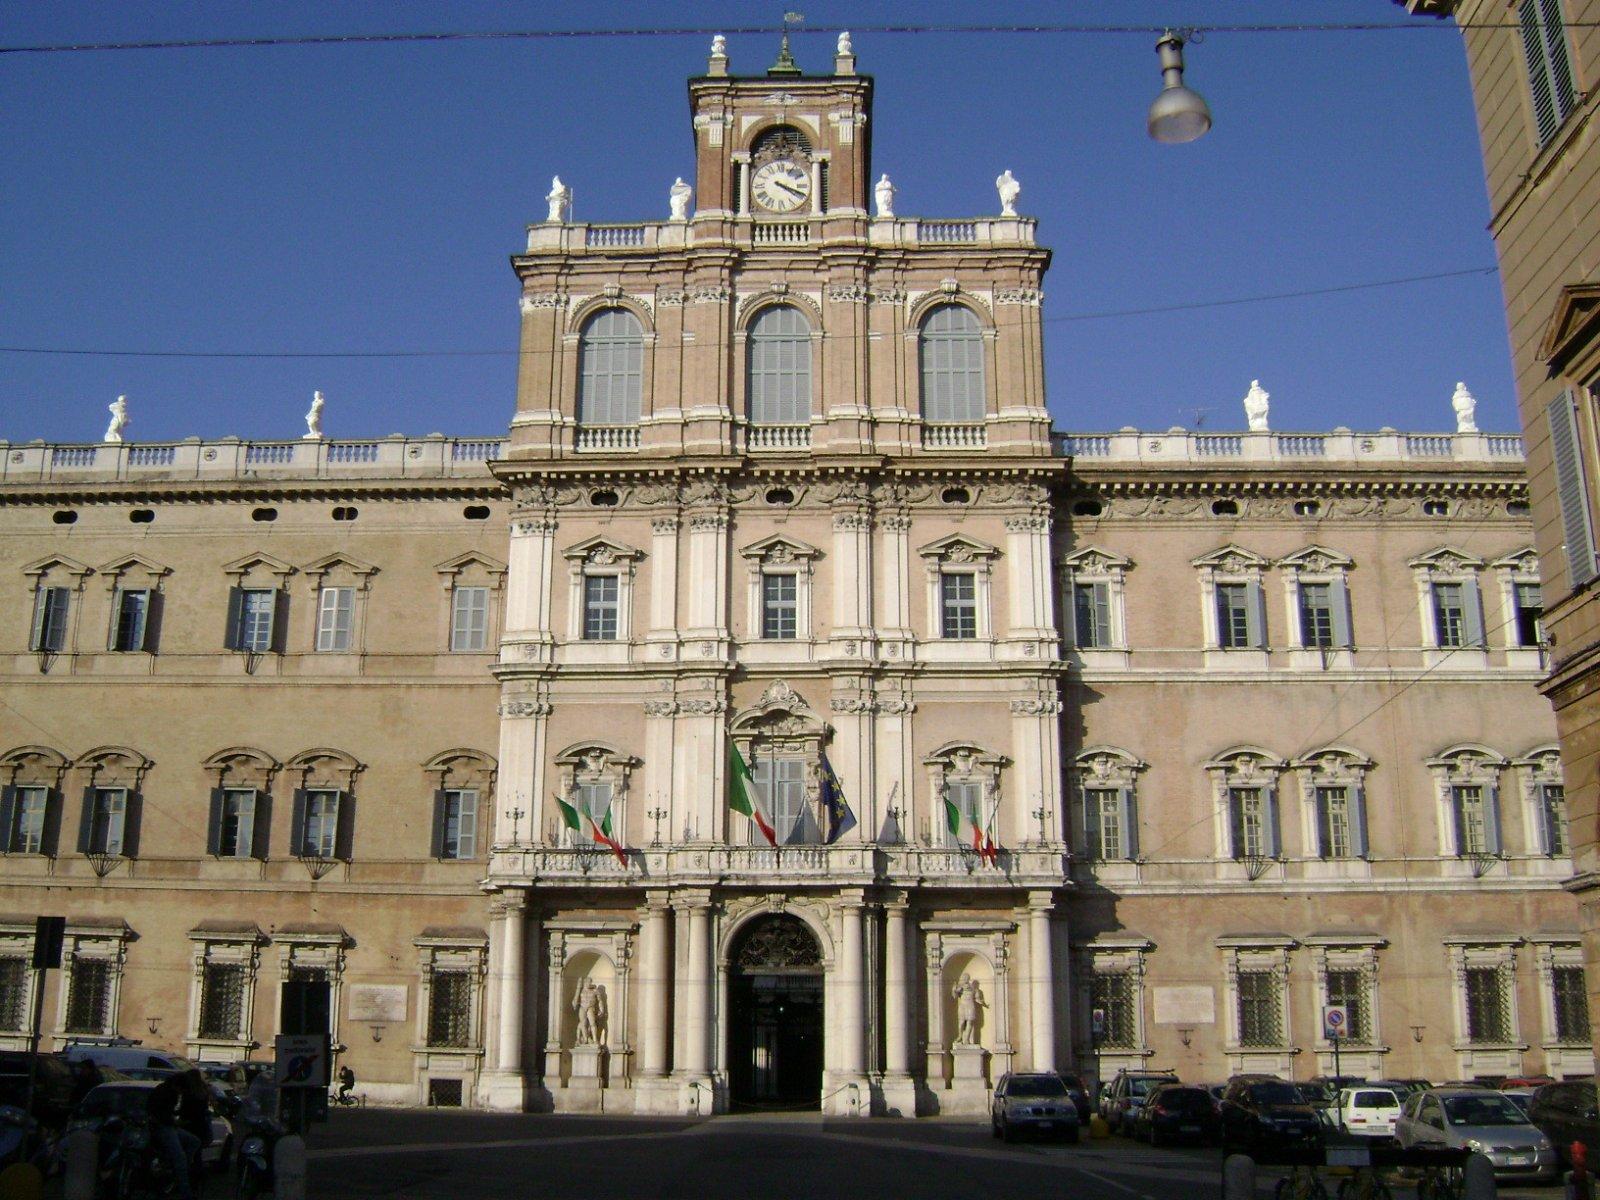 Модена — родина Энцо Феррари и Лучано Паваротти